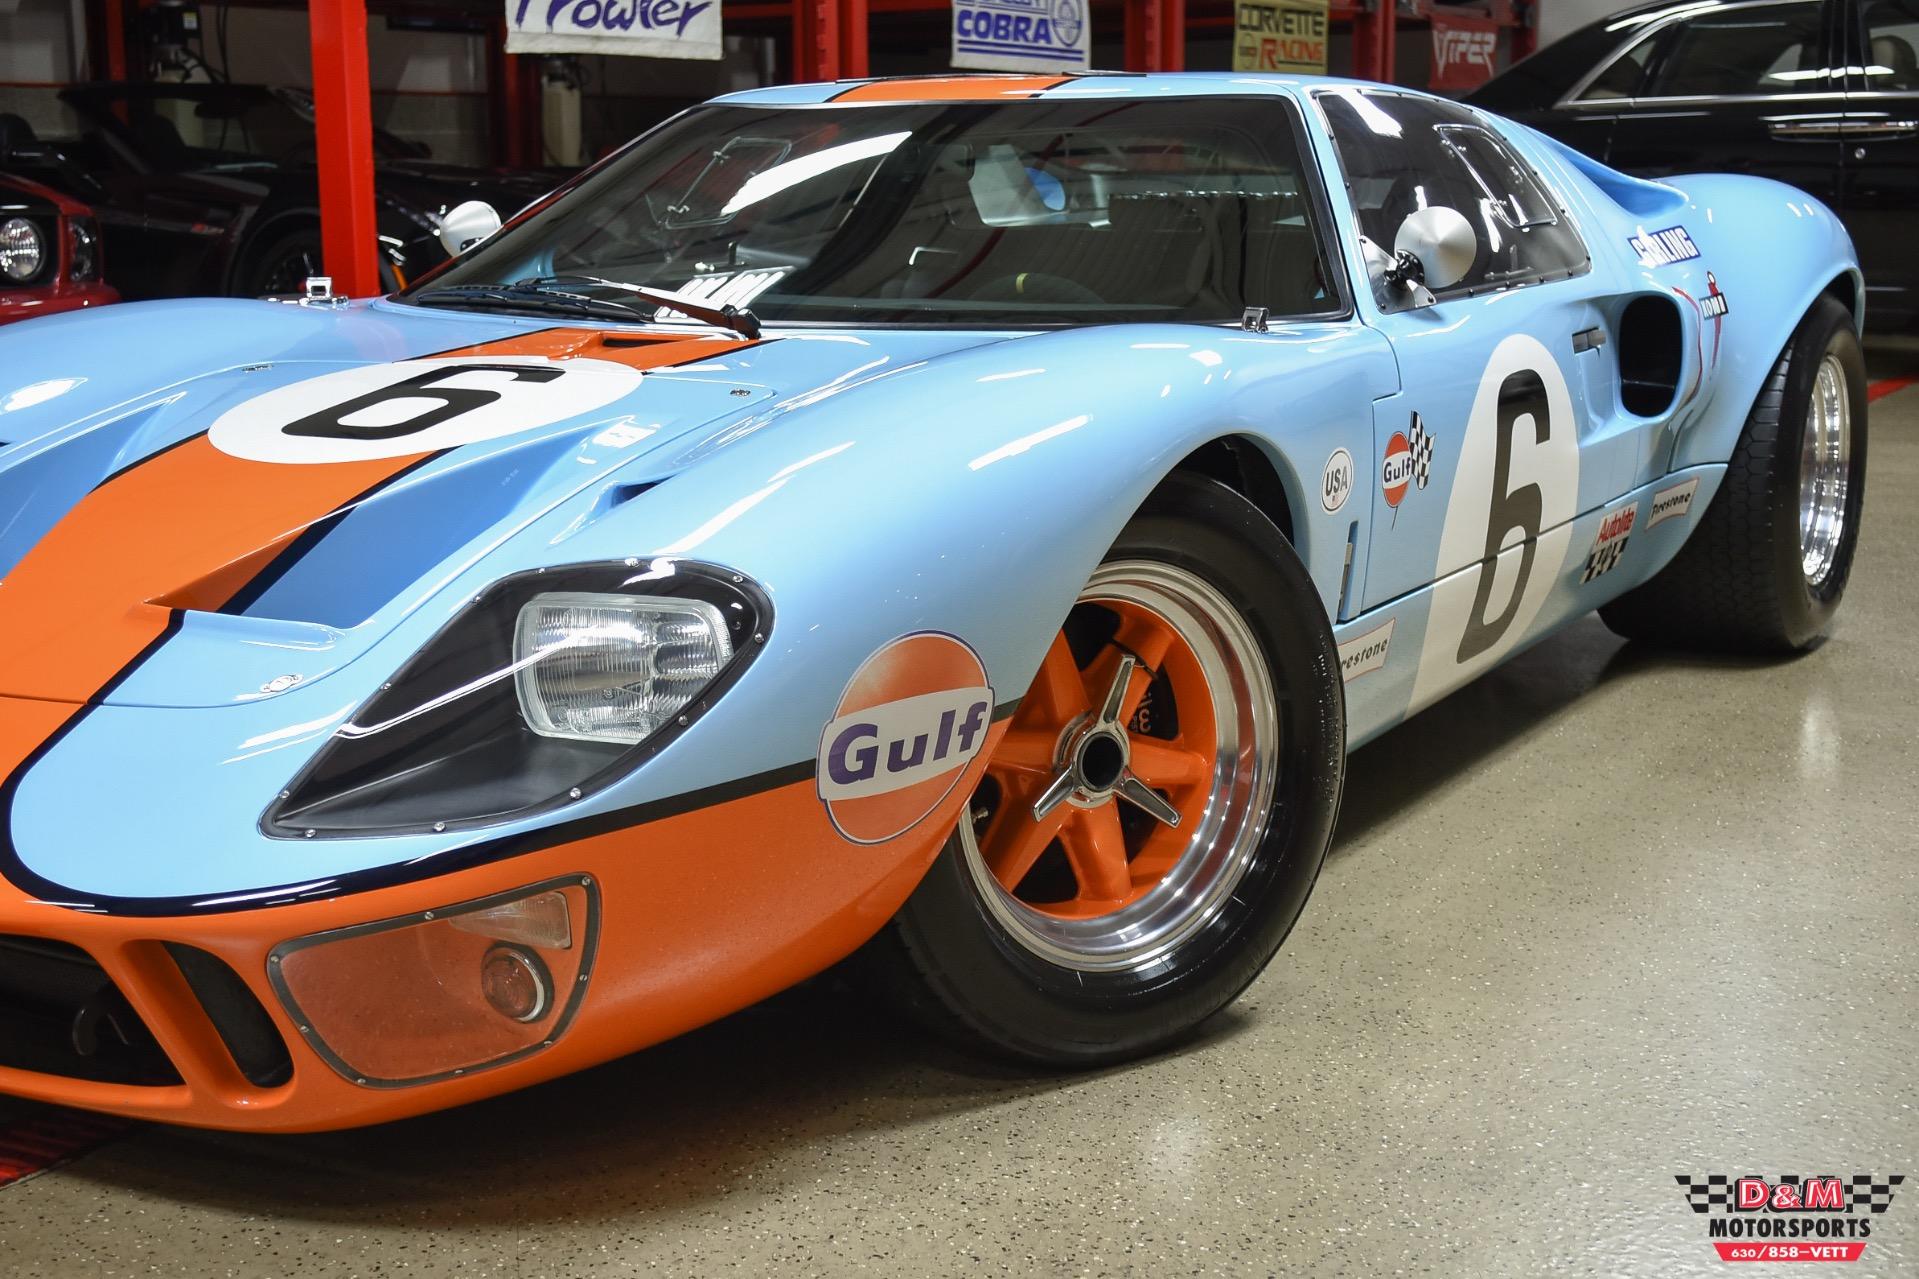 1969 Superformance GT40 Stock # M6755 for sale near Glen